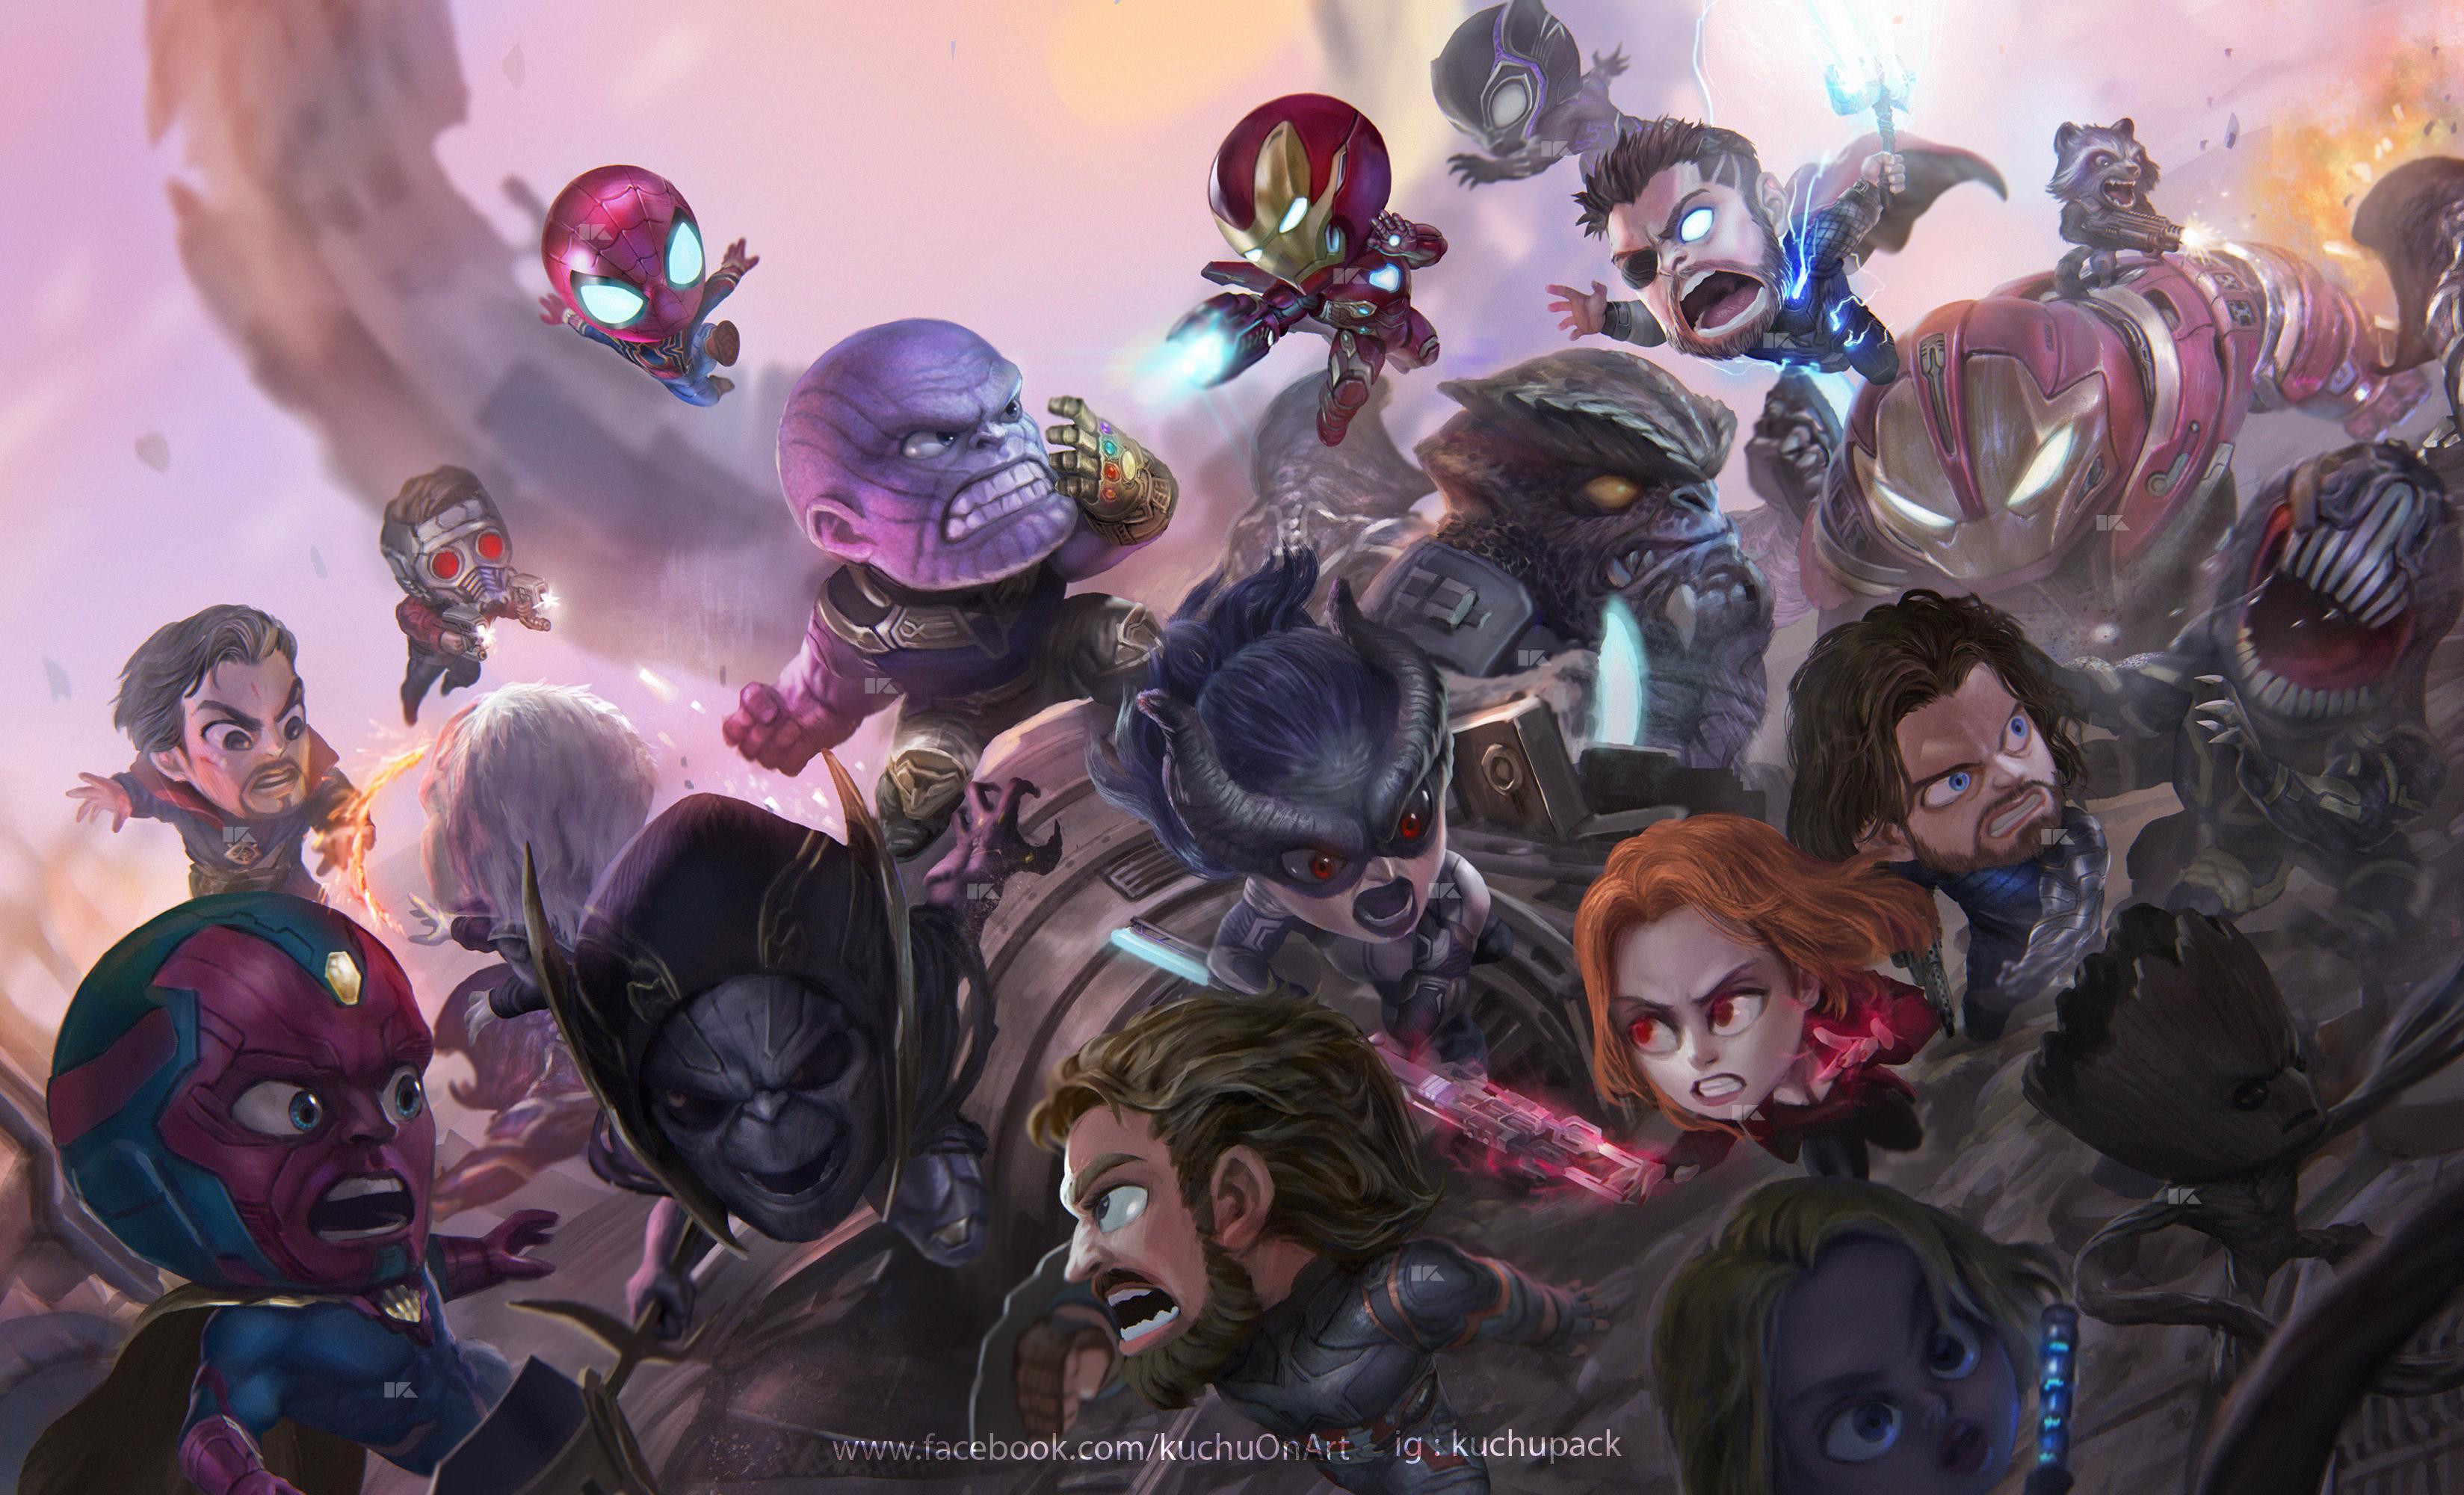 2880x1800 Chibi Avengers Infinity War Macbook Pro Retina ...